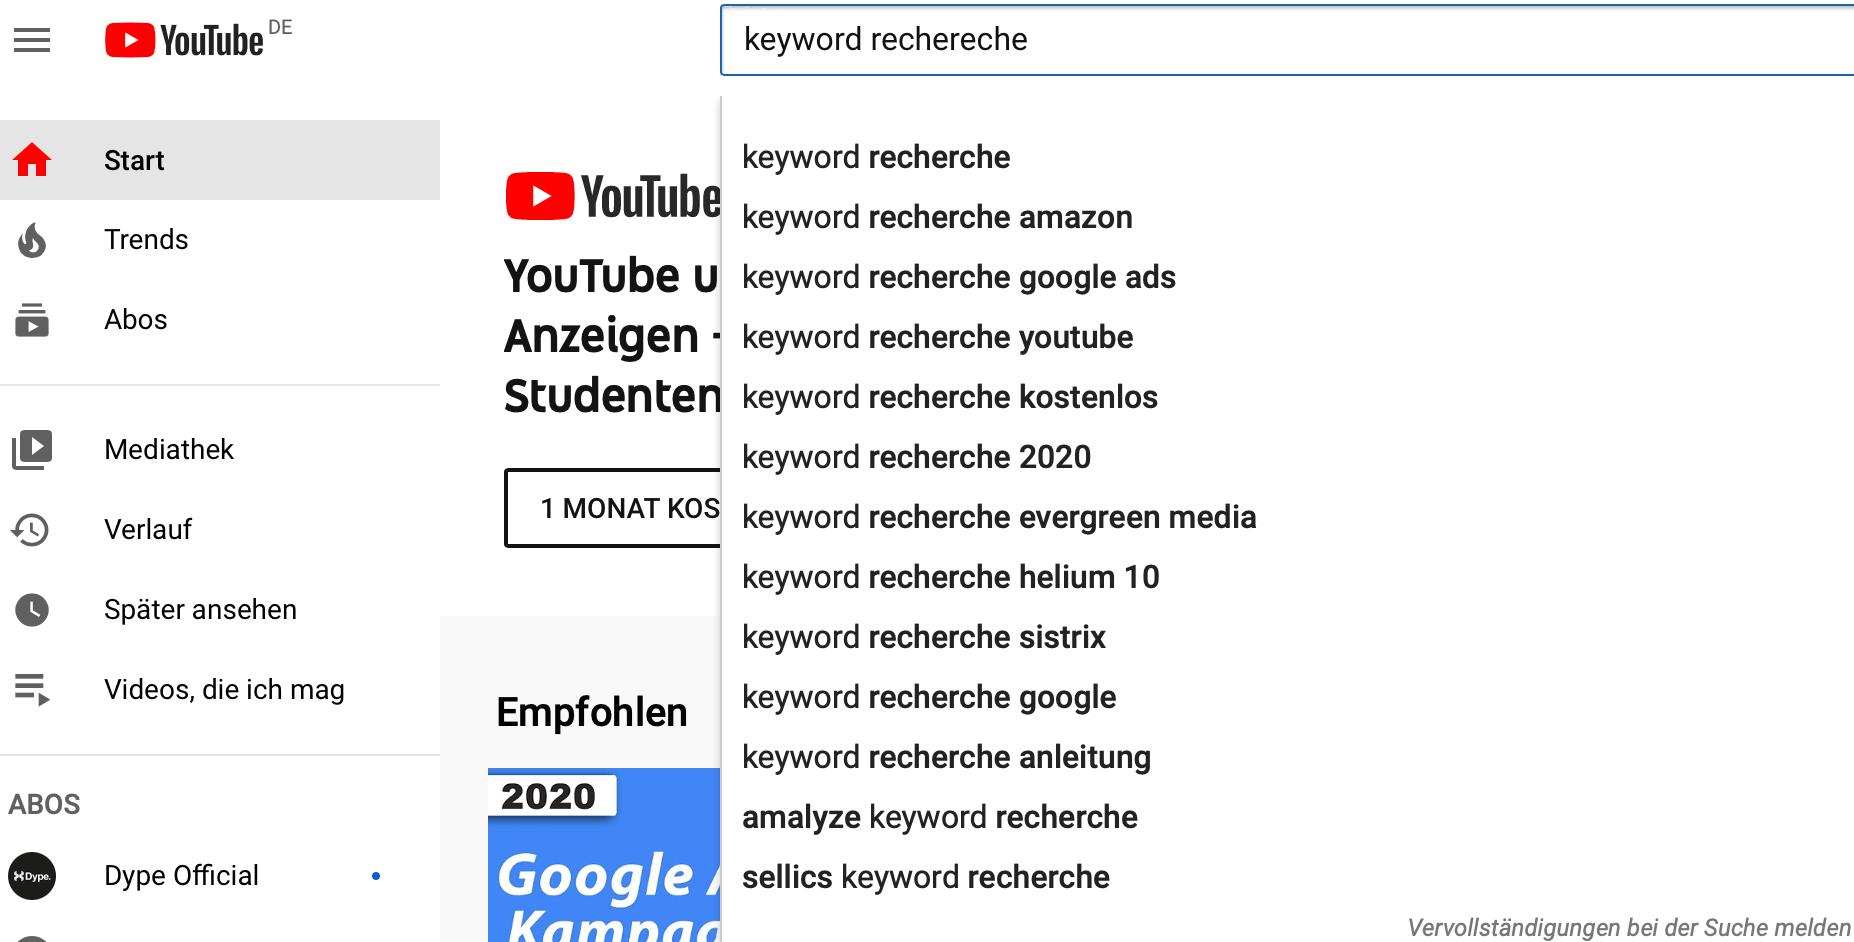 Keyword Recherche Youtube